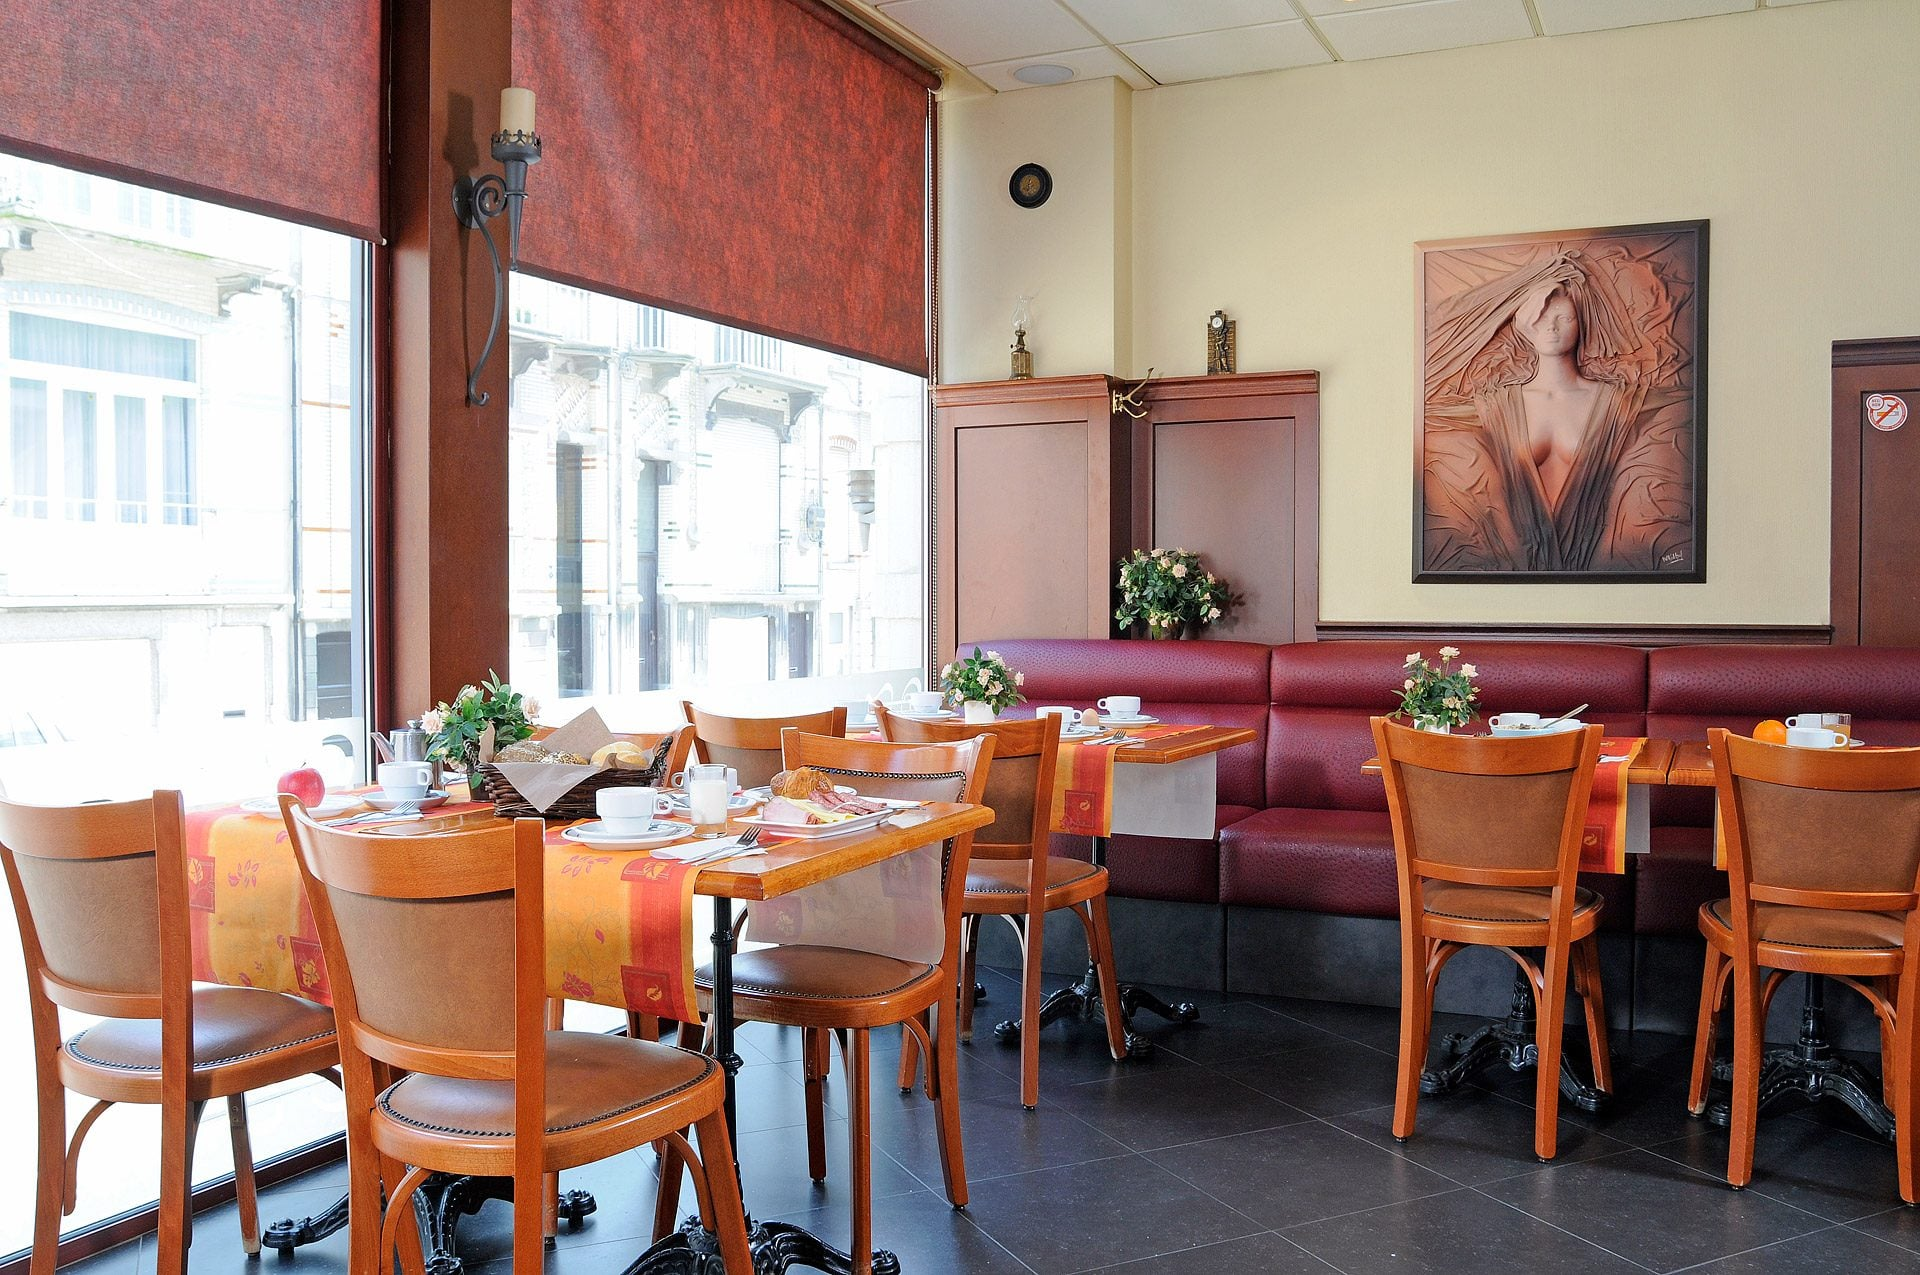 Petit déjeuner - Hotel Tropicana